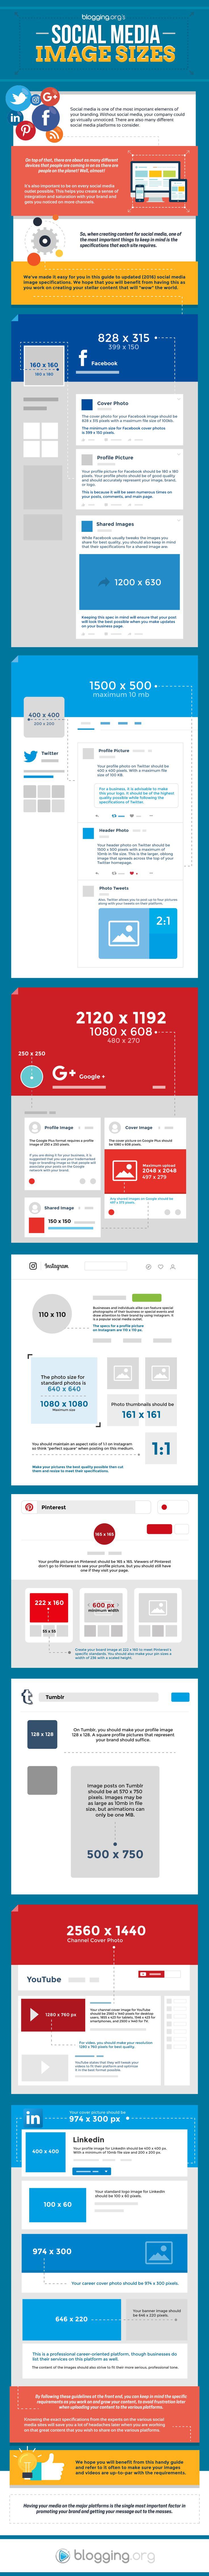 Social Media Image Guide Blogging HD